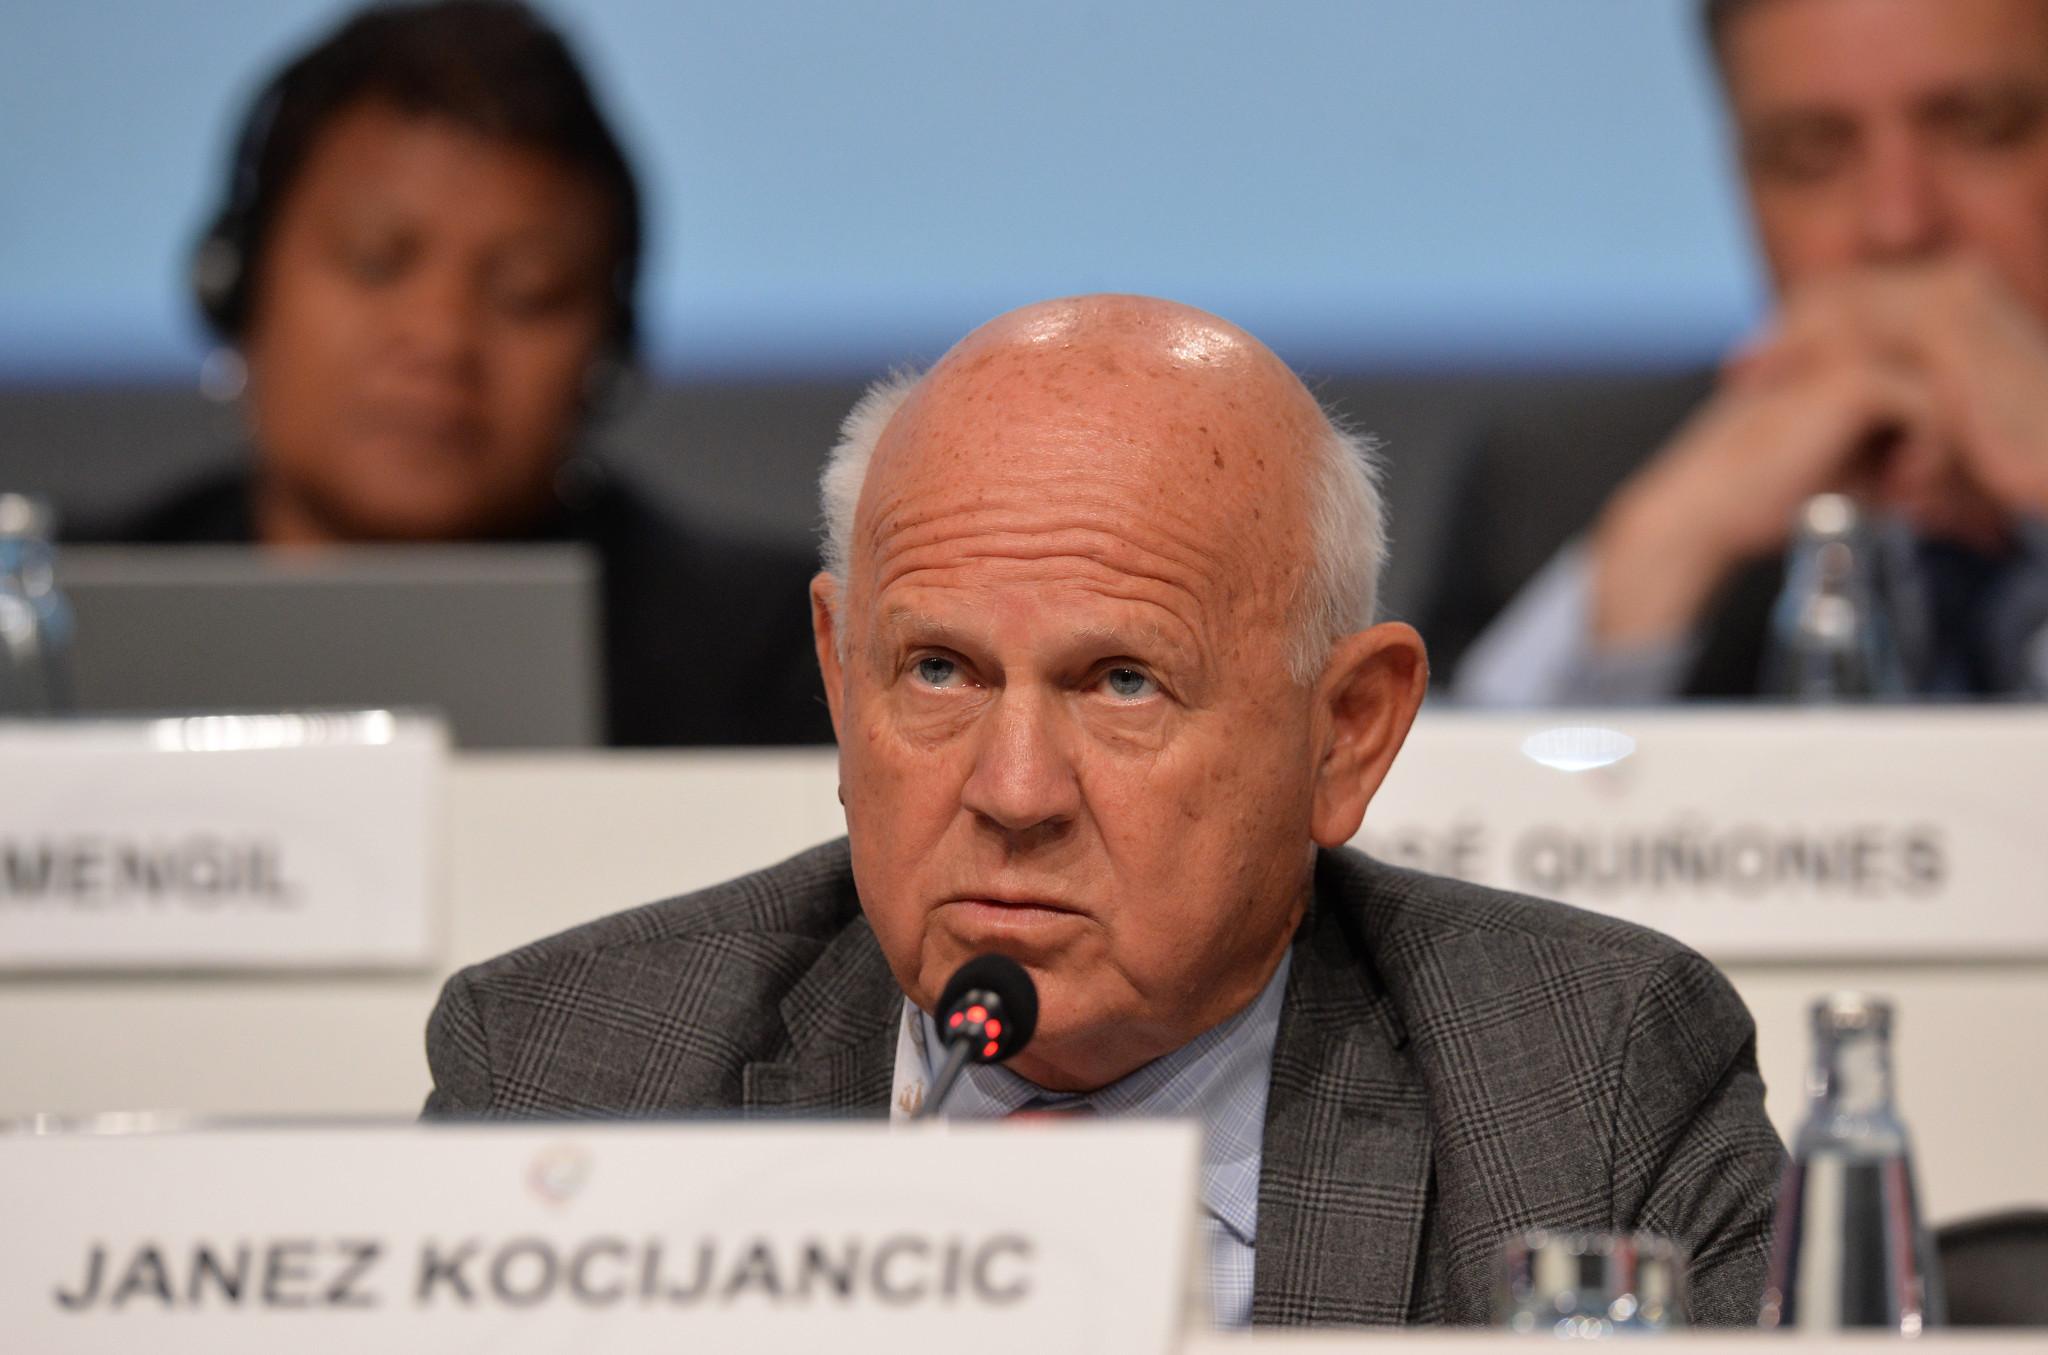 Kocijančič set to be elected unopposed as European Olympic Committees President